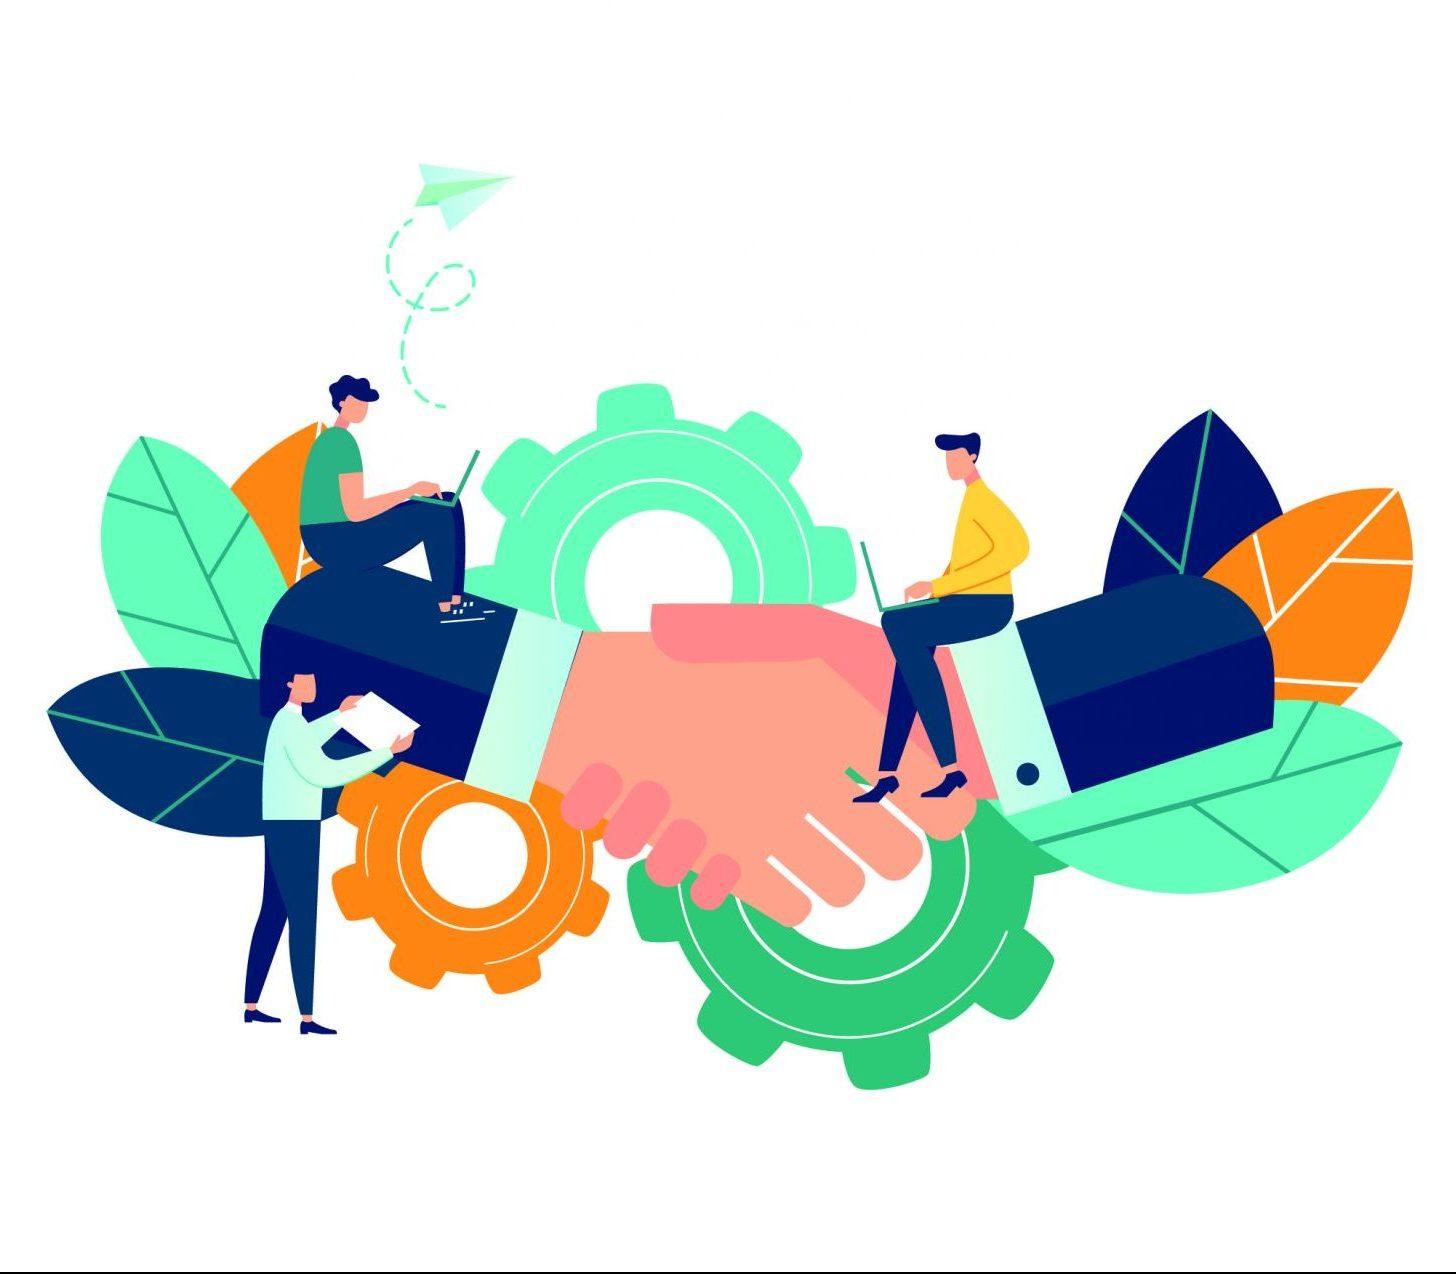 Vi inviterer kommuner med på forskning om sirkulærøkonomi